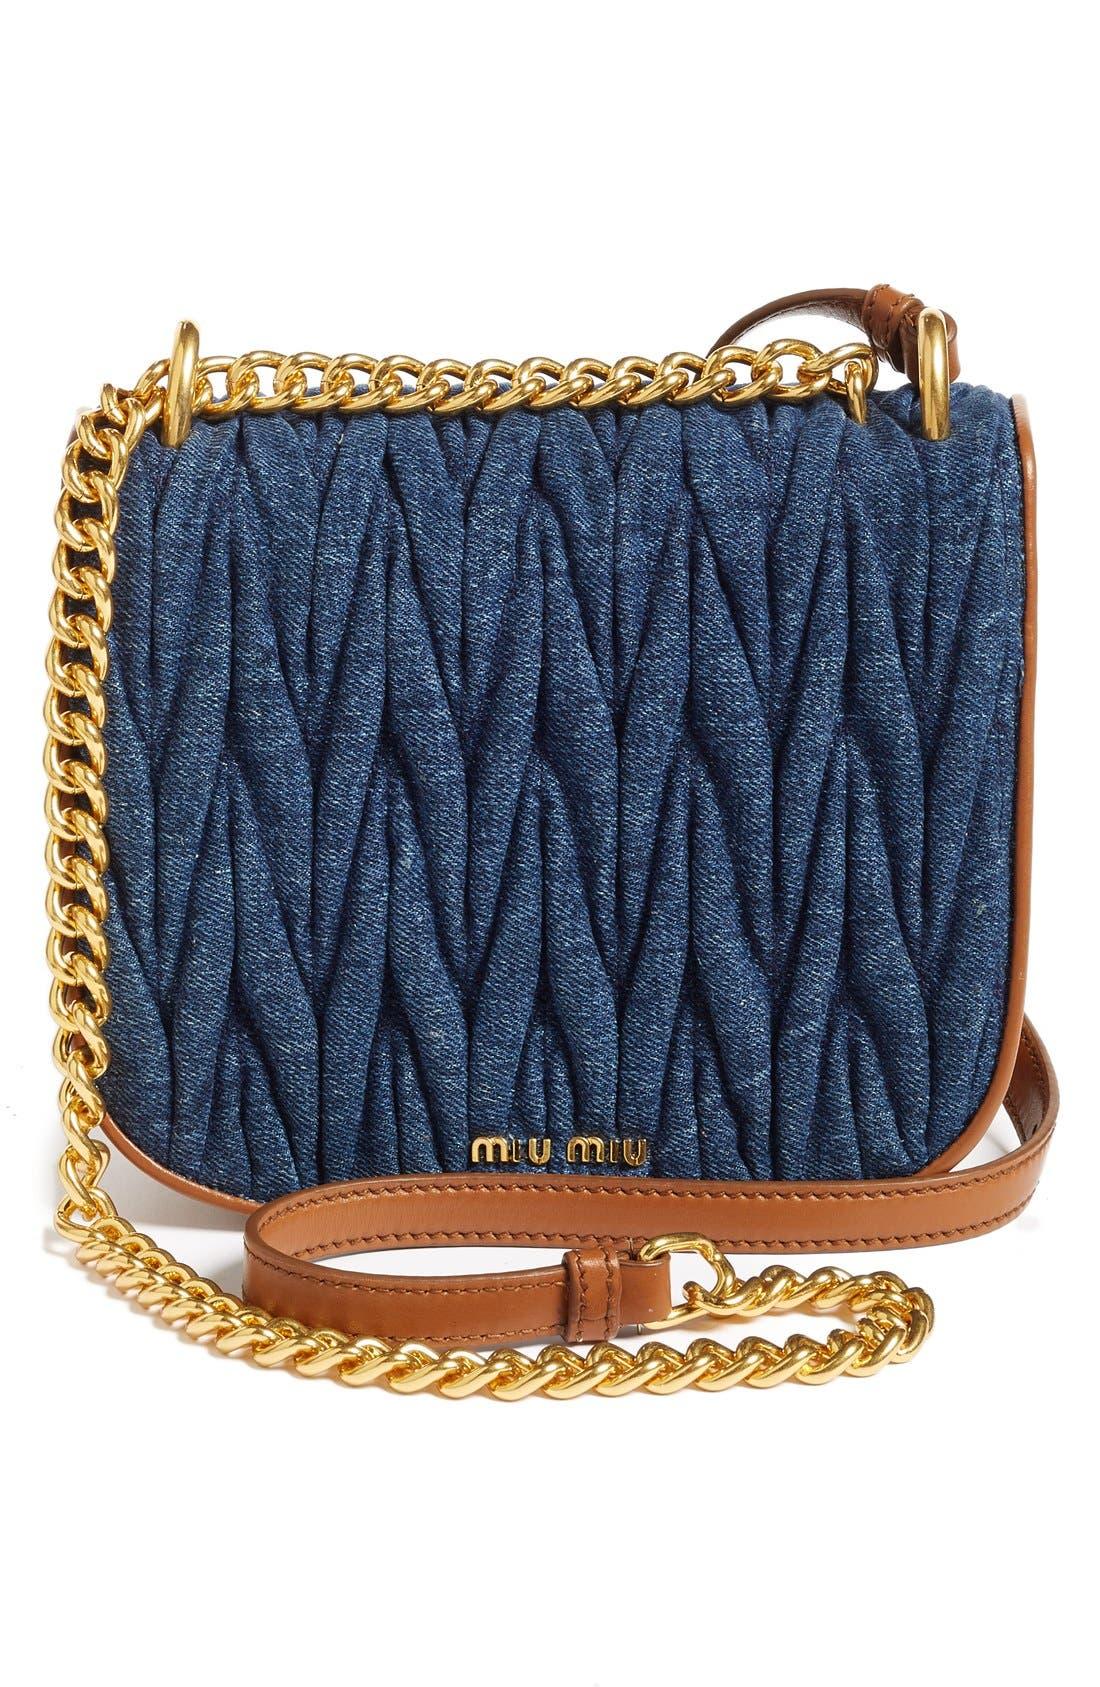 Matelassé Crossbody Bag,                             Alternate thumbnail 10, color,                             901